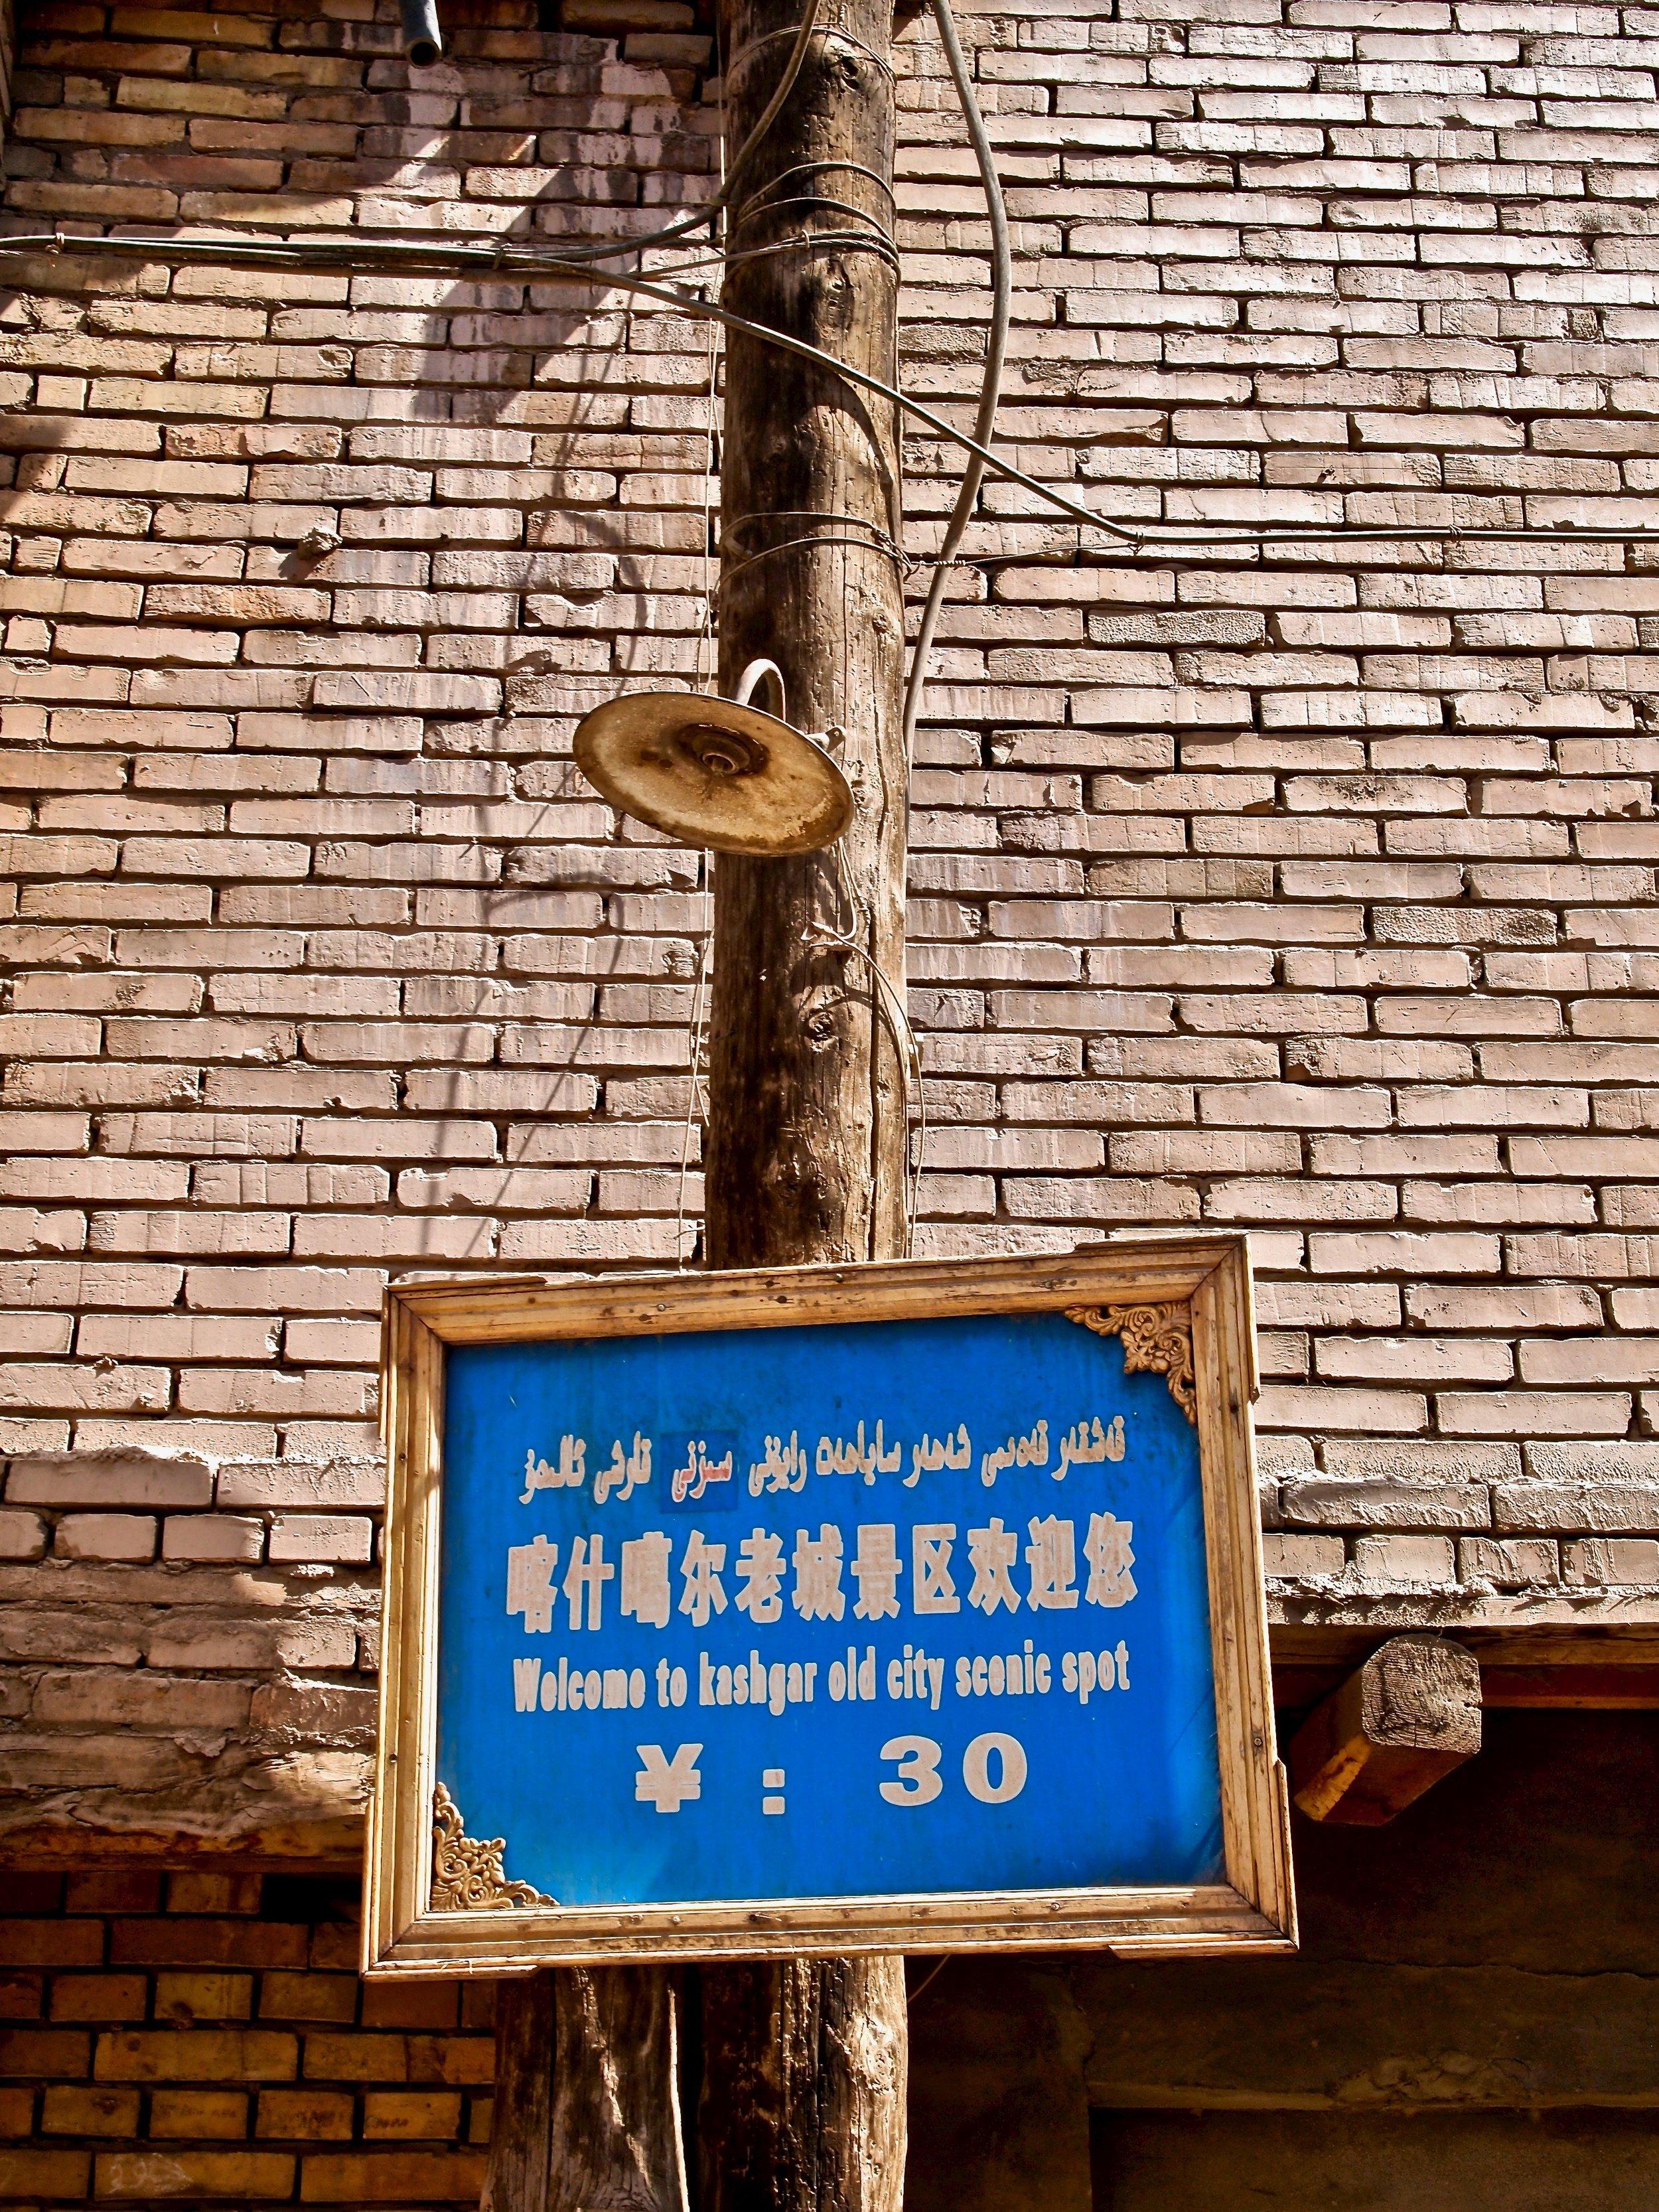 Sign at the entrance to the old town of Kashgar, Xinjiang, China. (C) Remko Tanis